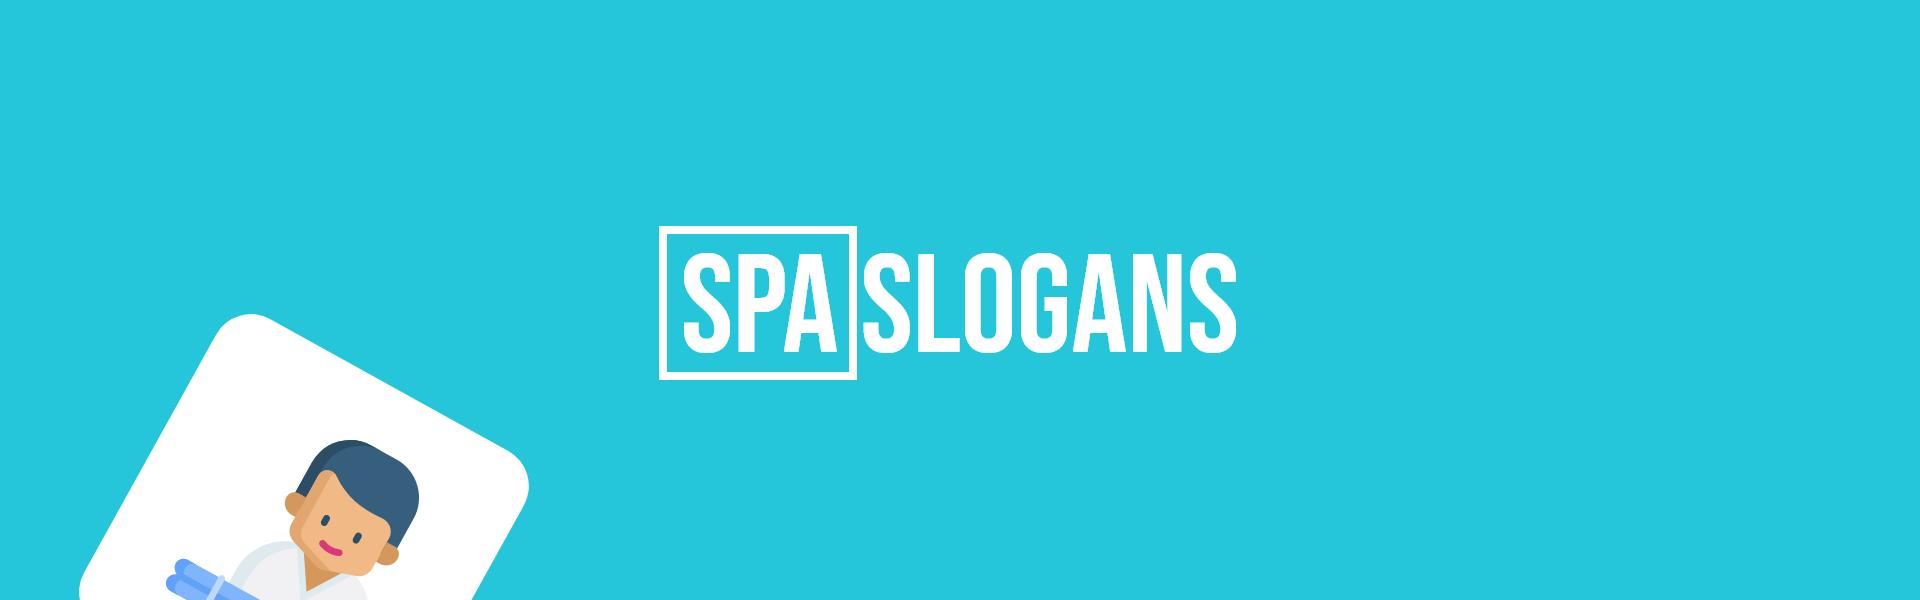 spa slogans taglines